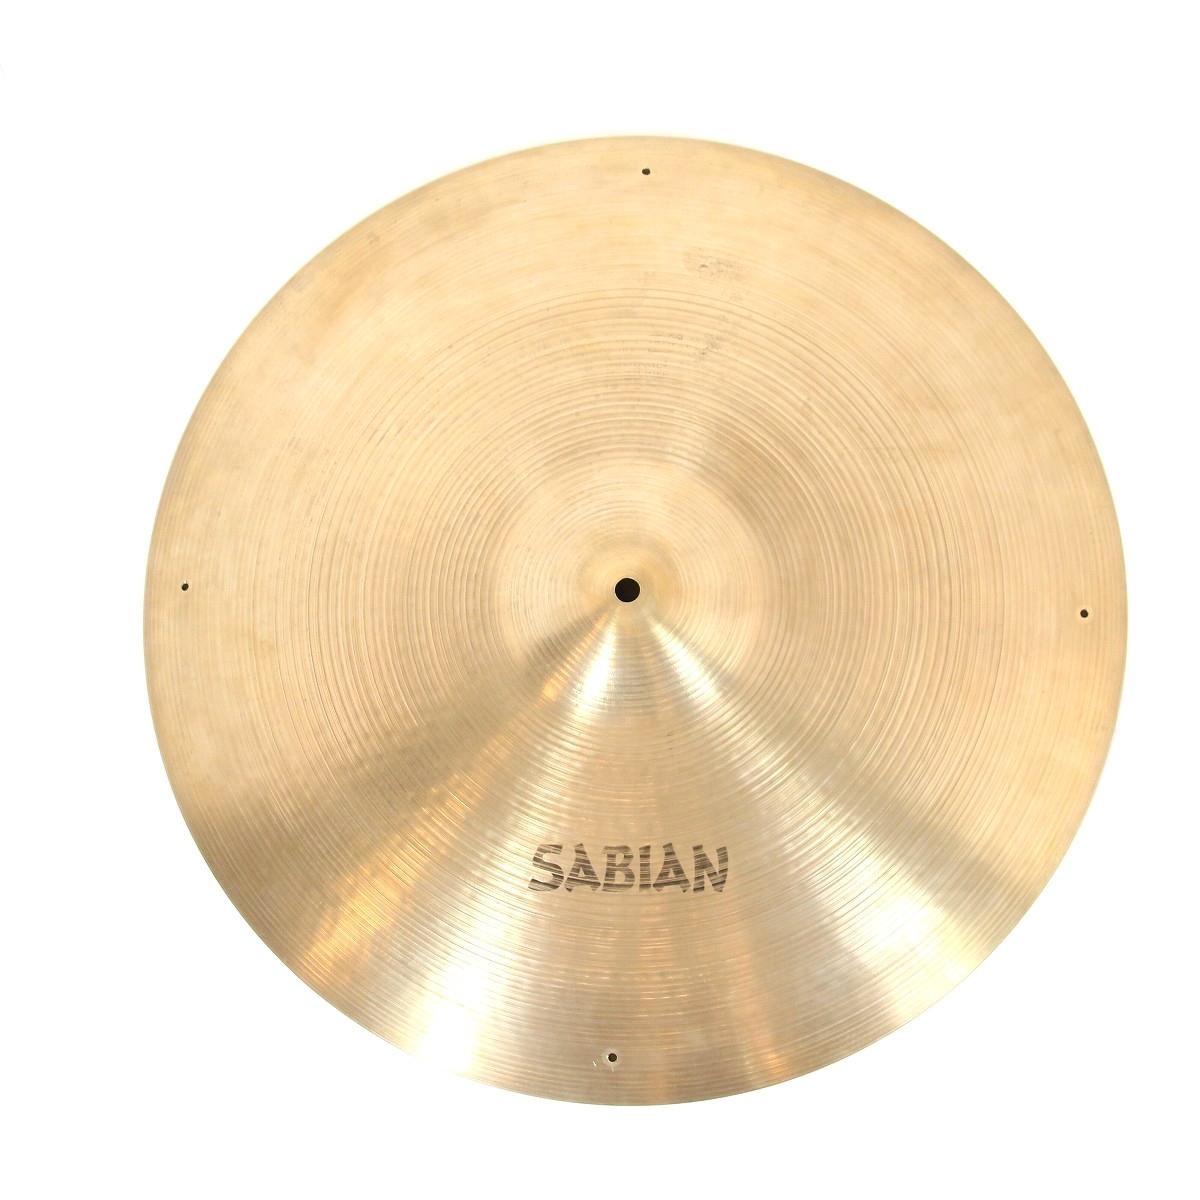 SABIAN 1980s AA 20インチ MEDIUM RIDE 2670g ミディアムライド ライドシンバル 【御茶ノ水ドラム館】